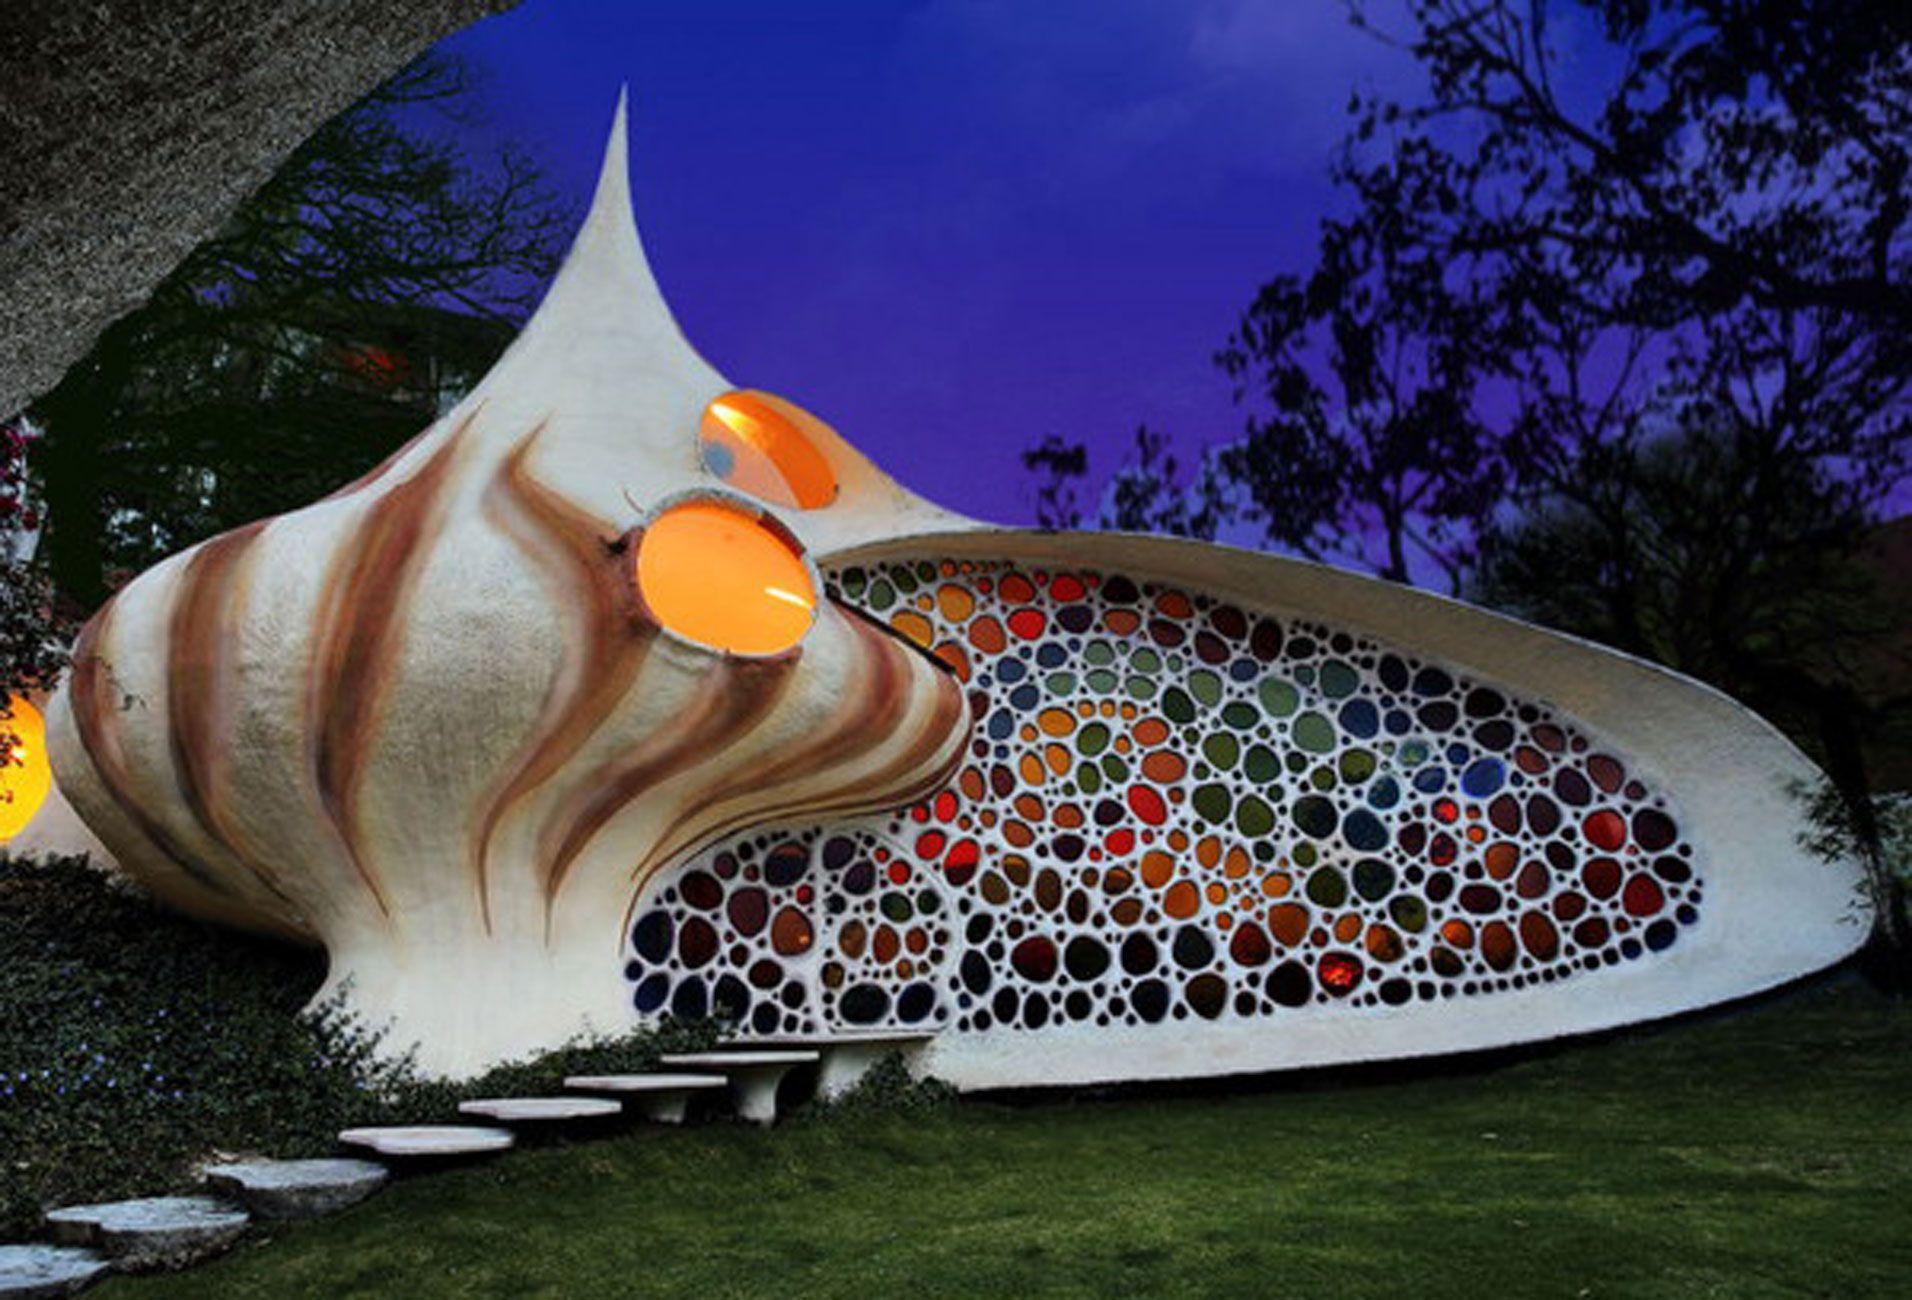 shell shaped house unique home design from arquitecturaorganica - Unique Home Design